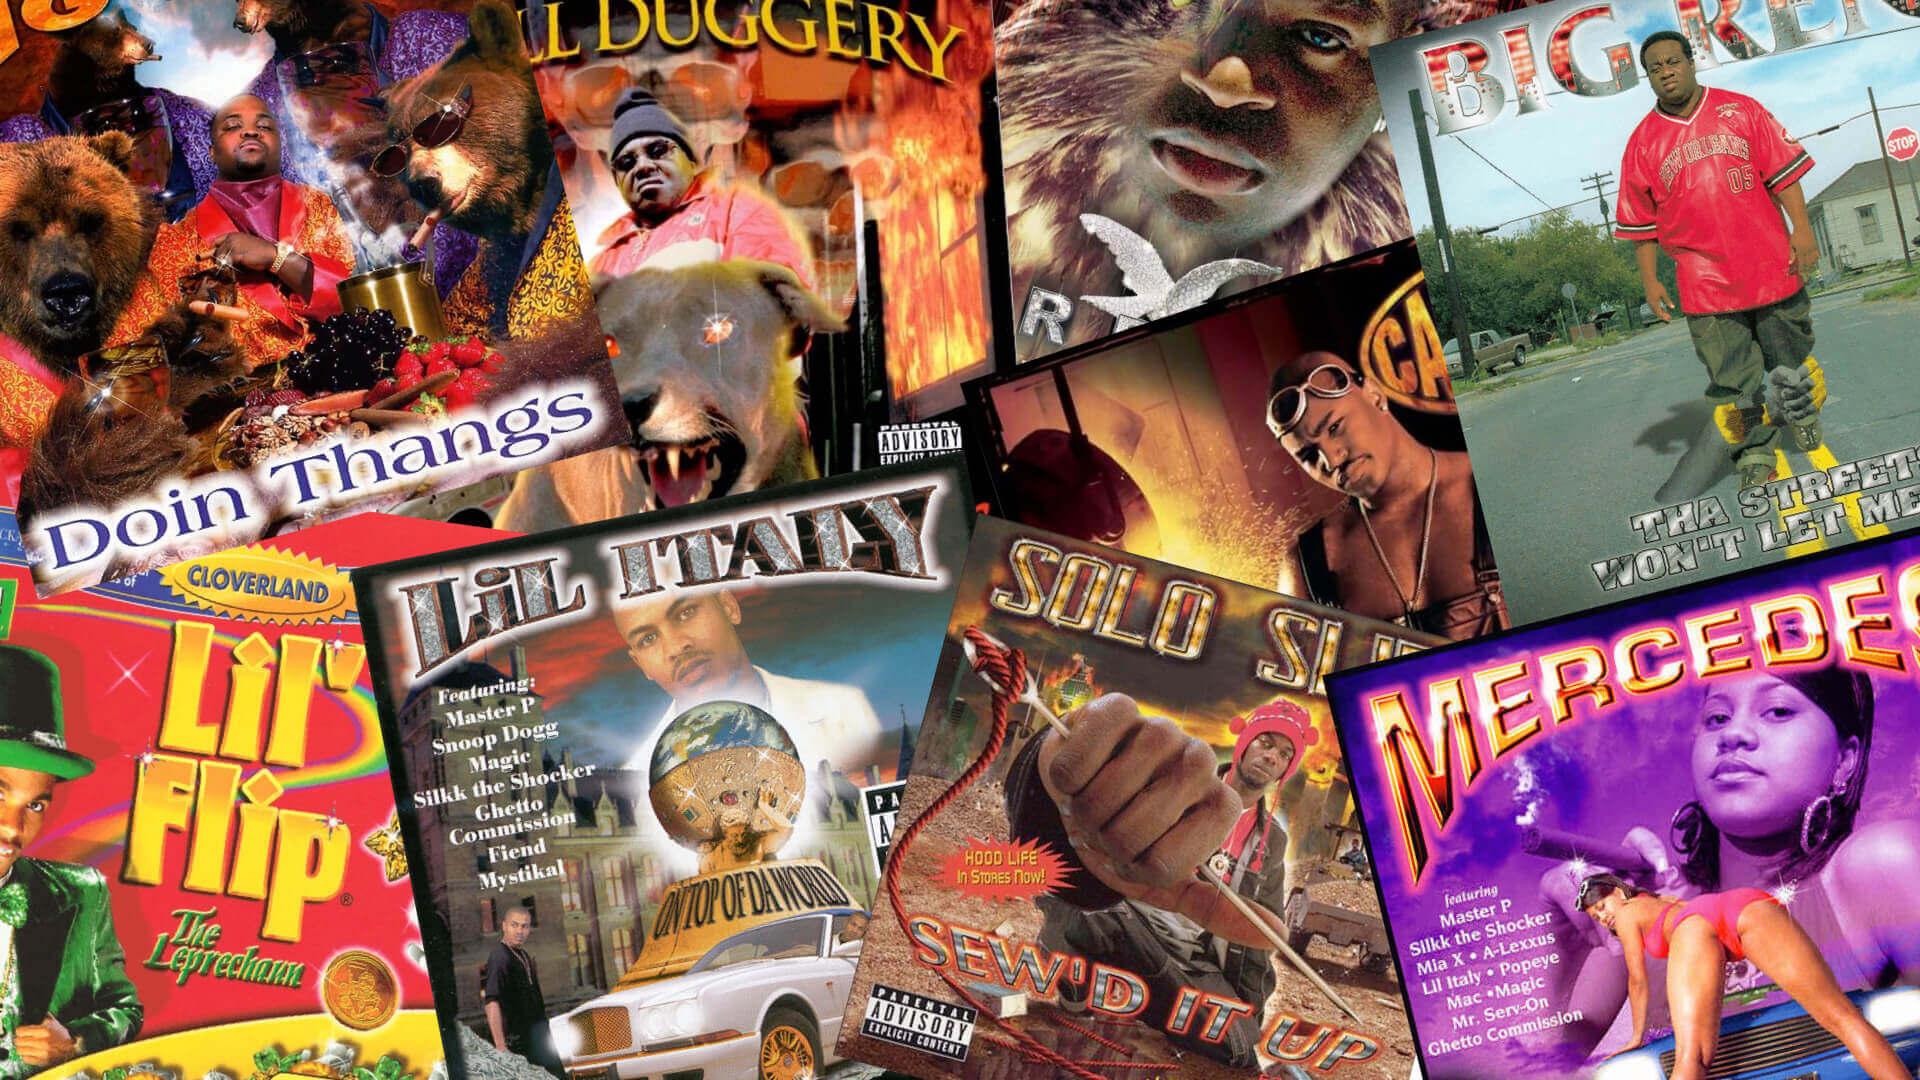 worst-rap-albums-cover-ever